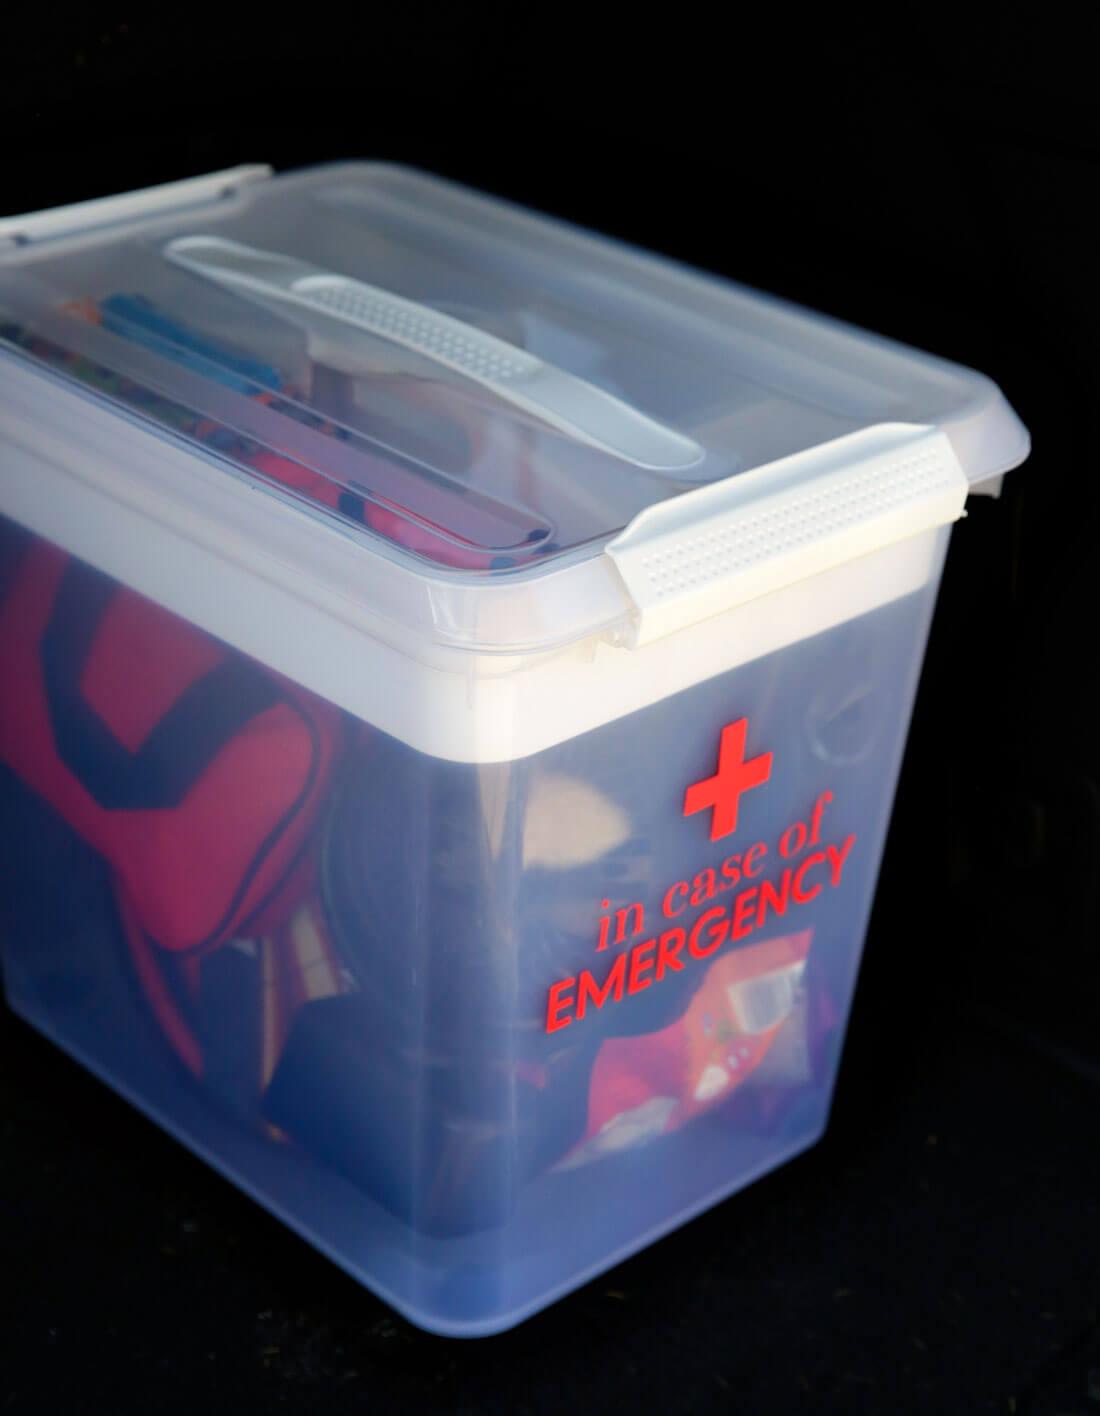 Car emergency kit in the car